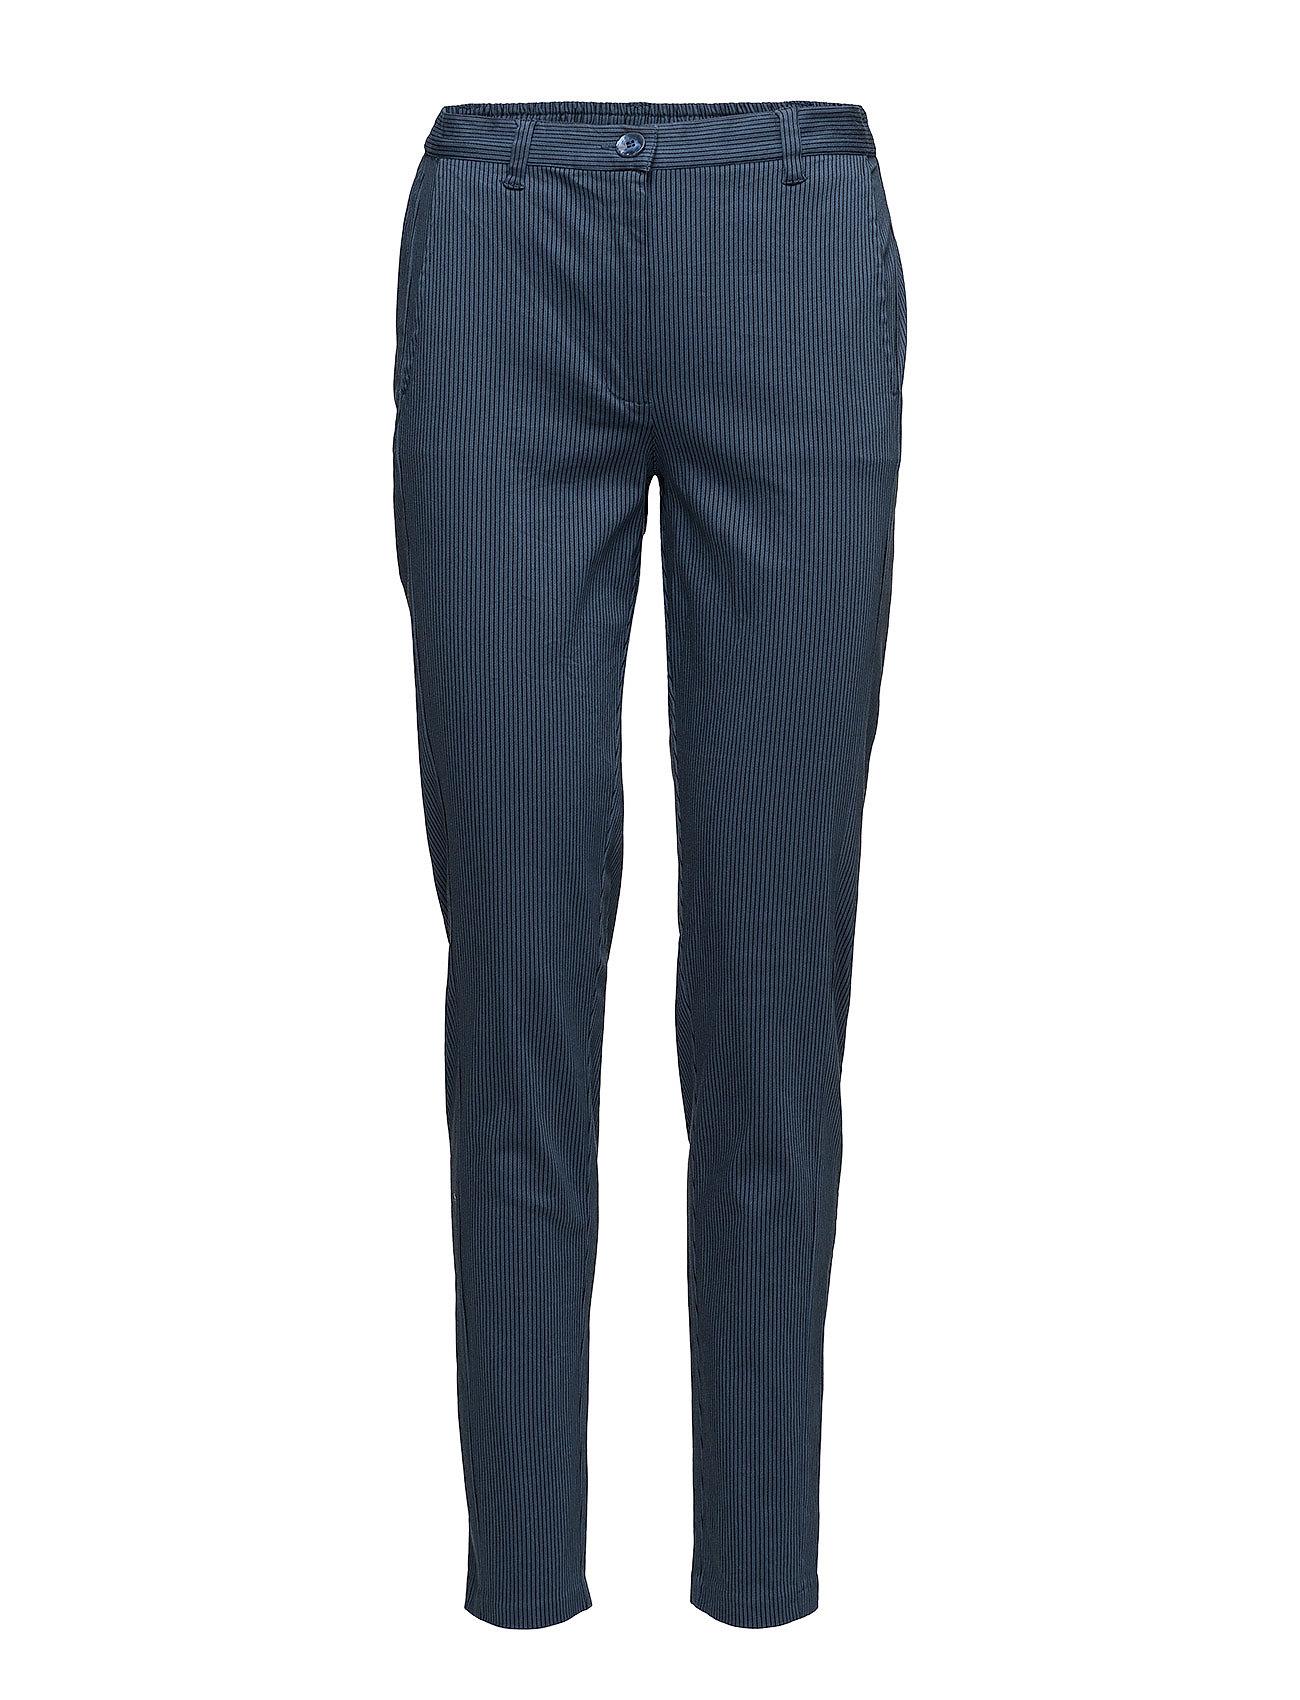 Masai Piara trousers Byxor